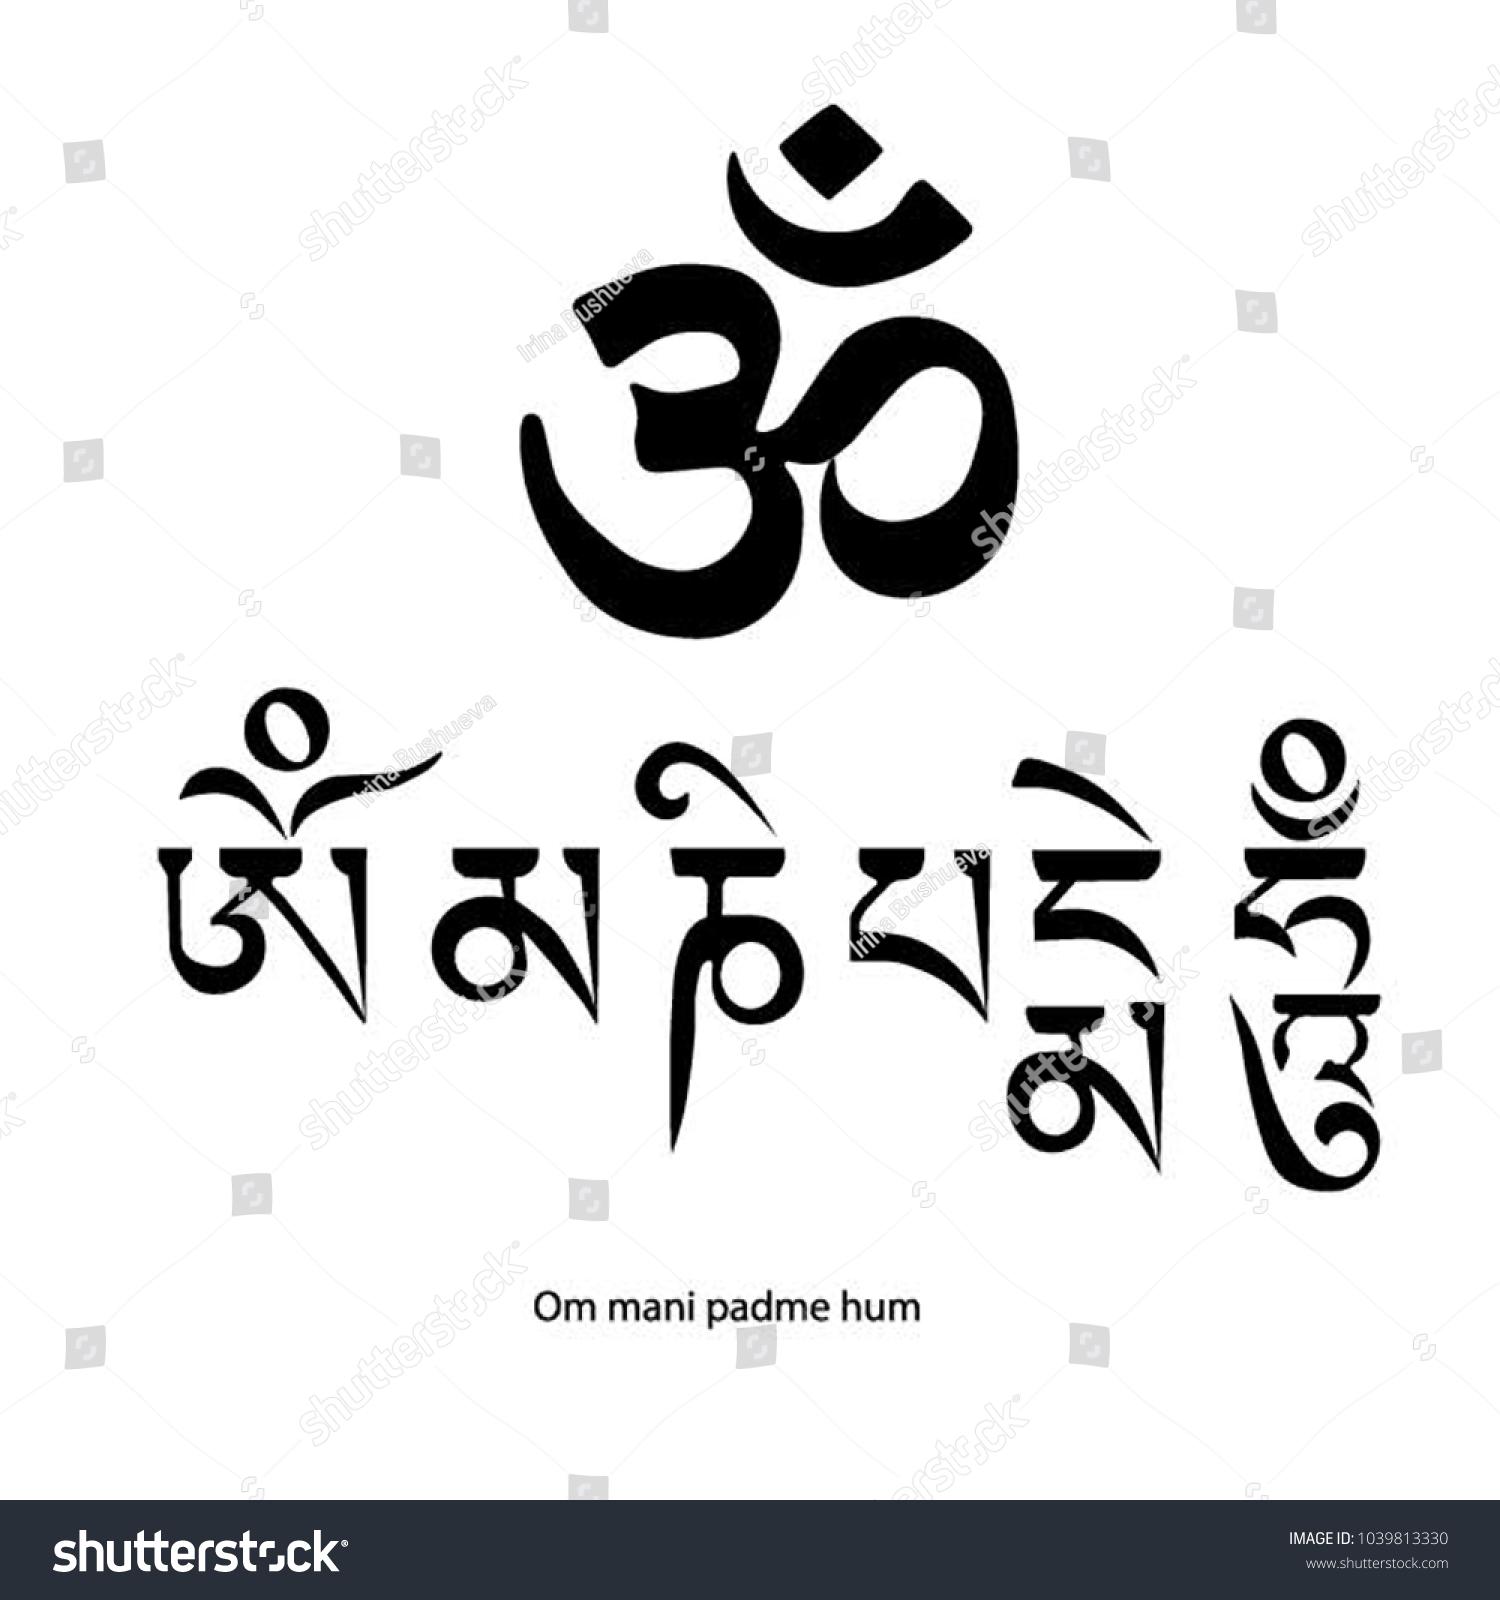 Om mani padme hum buddhist symbol stock vector 1039813330 om mani padme hum buddhist symbol isolated black vector on white background buycottarizona